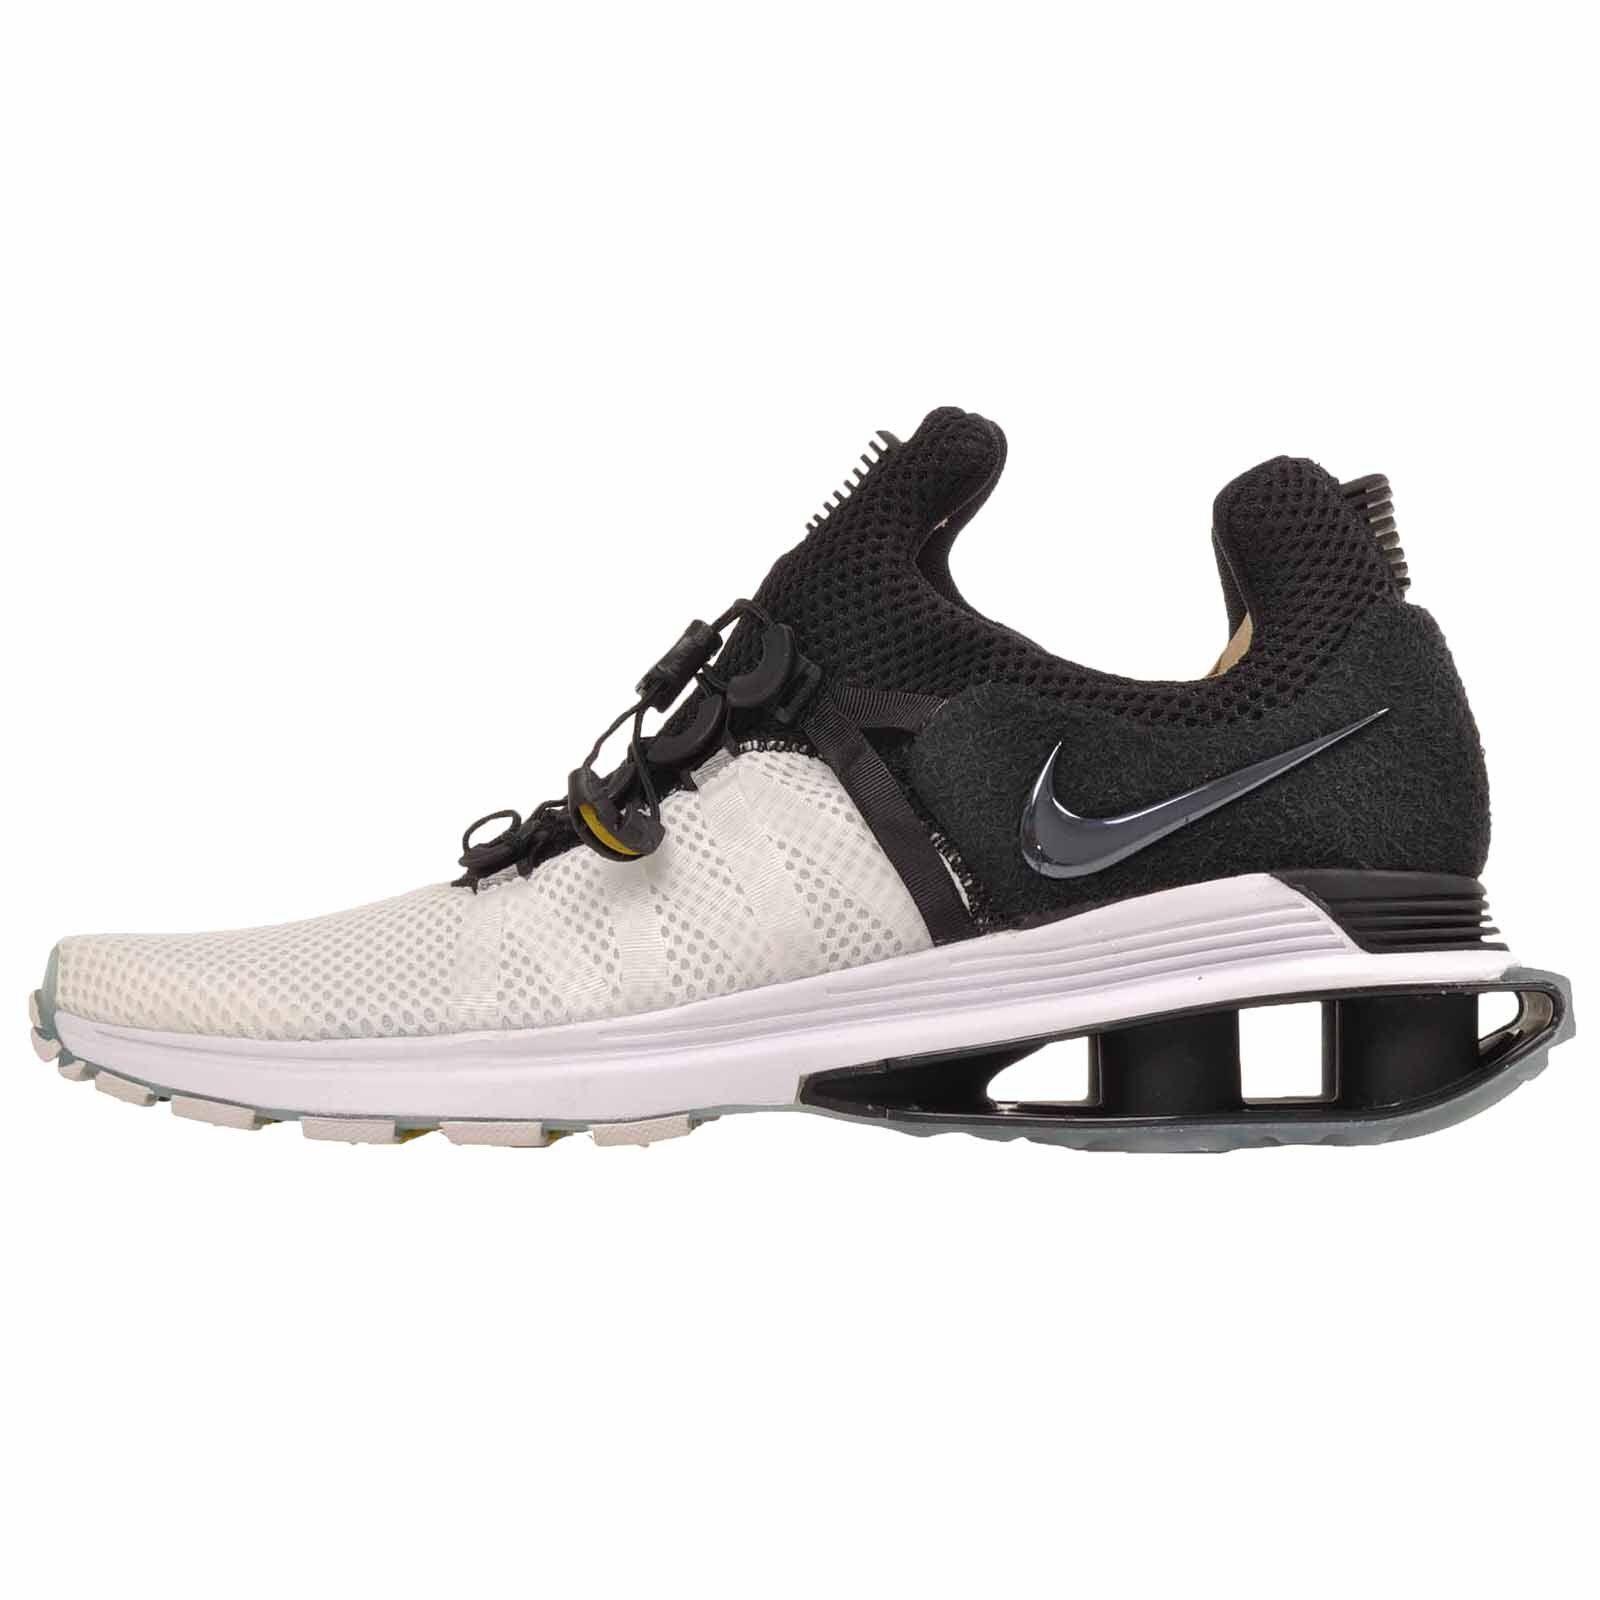 40b9fba664fa Nike Shox Gravity Running Running Running Mens Shoes White Black AR1999-101  feaae5